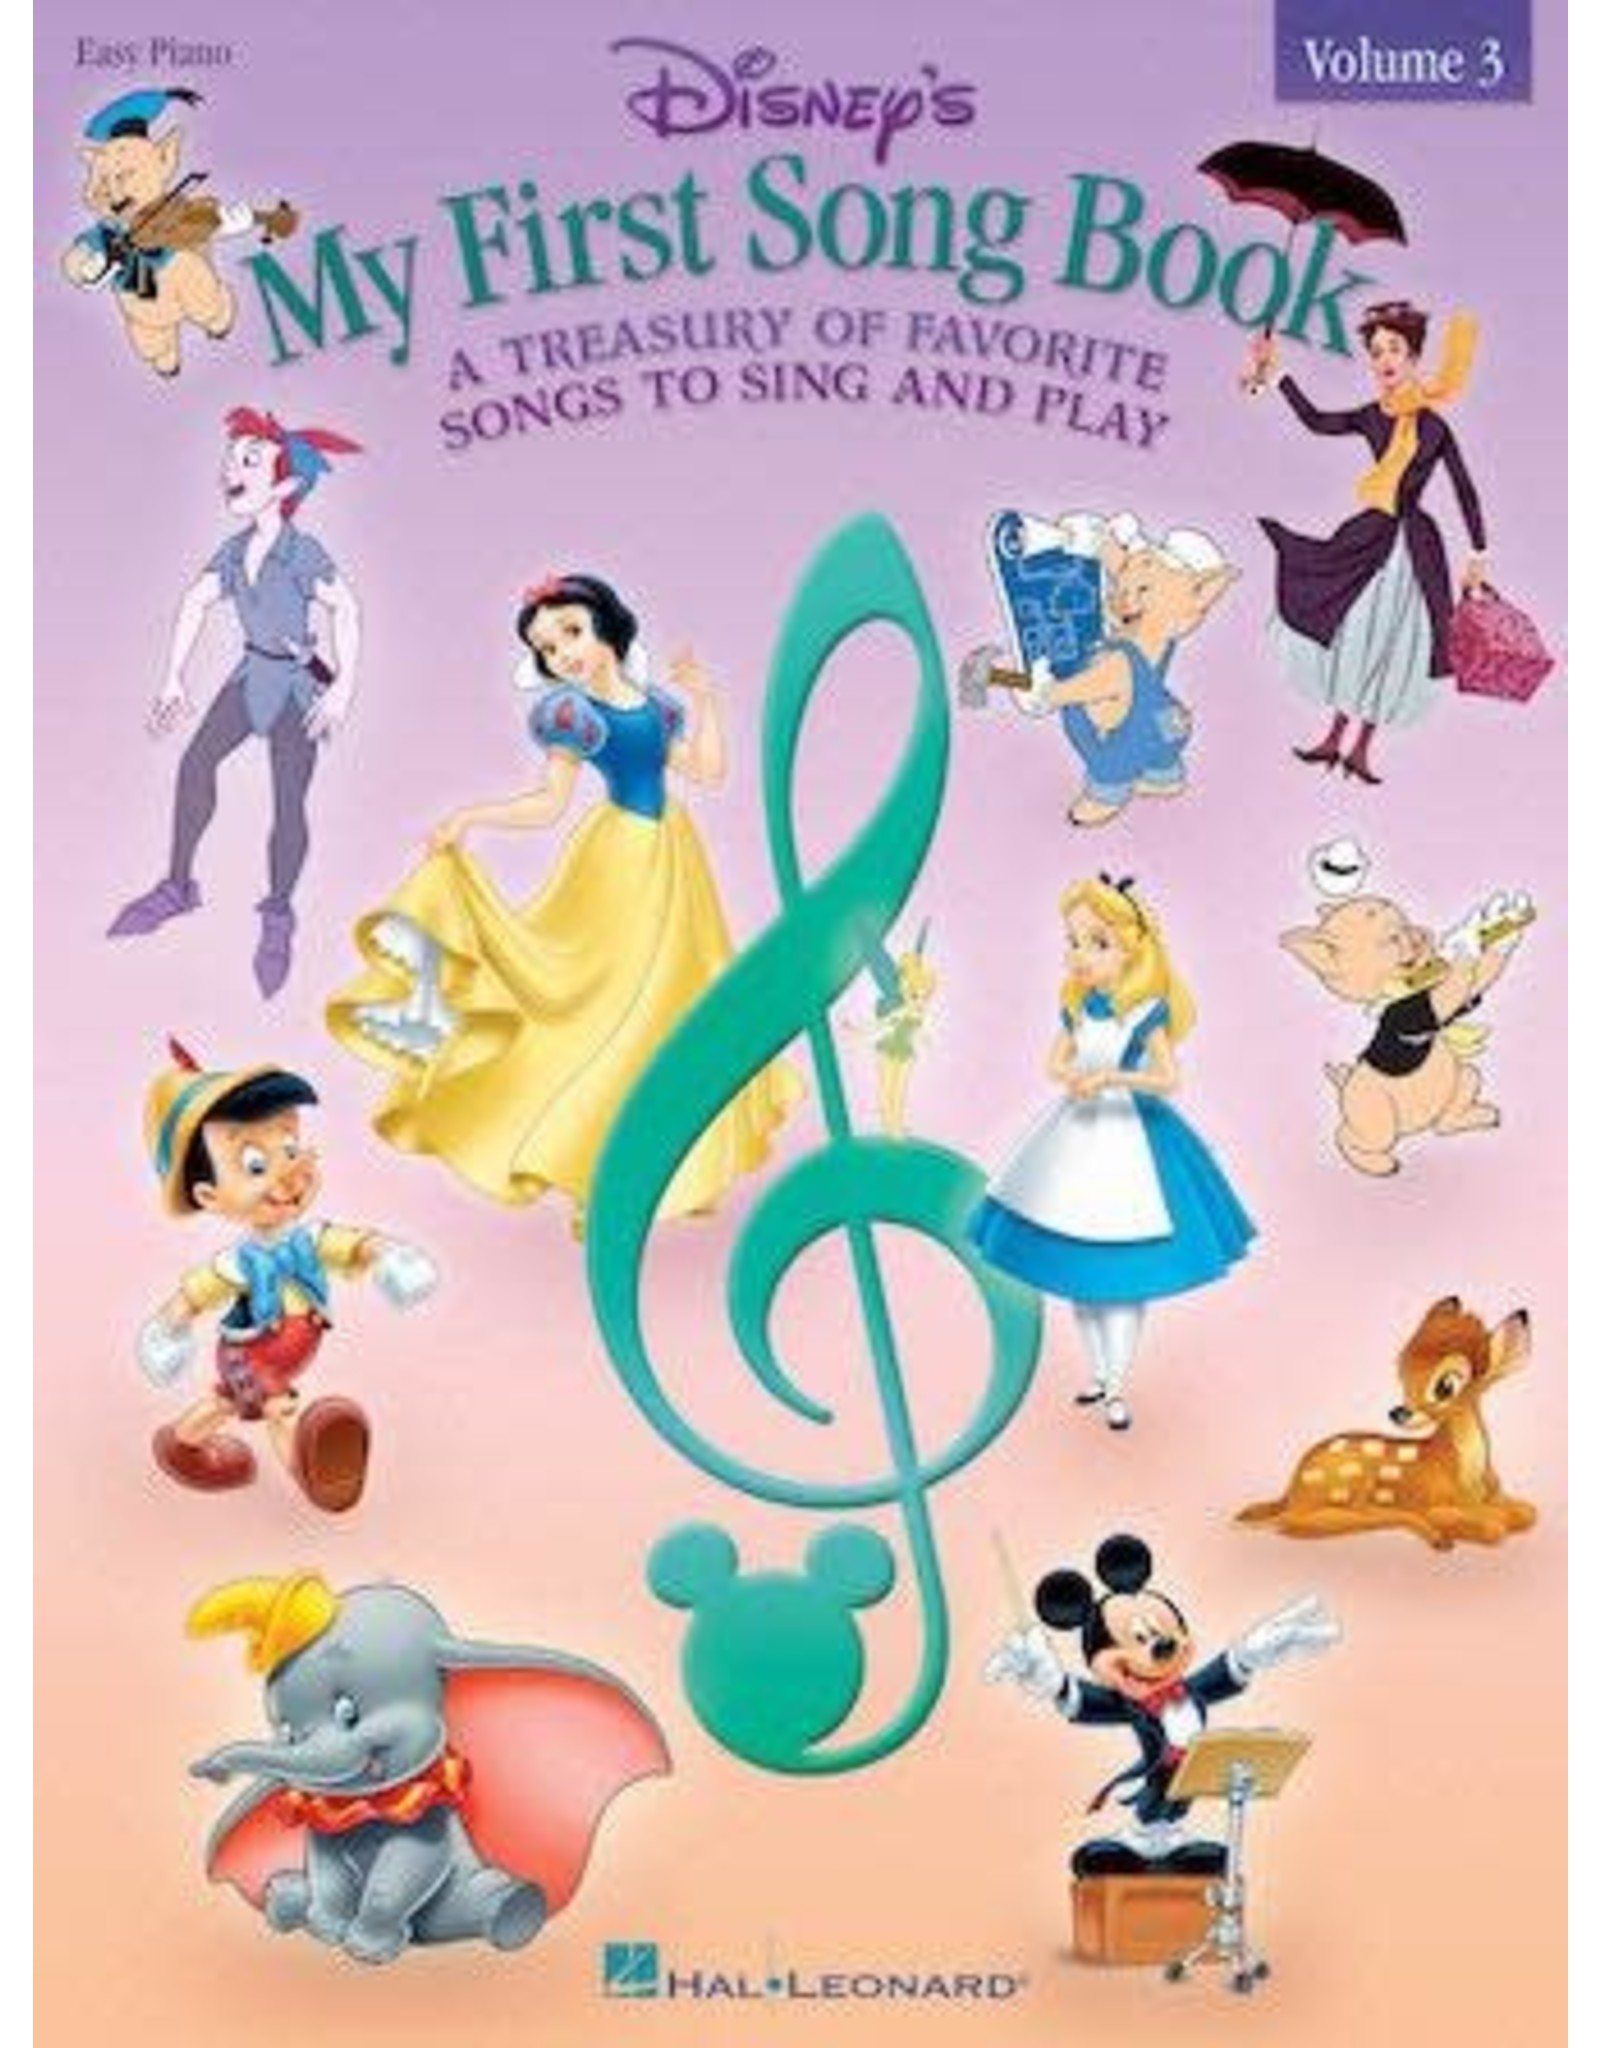 Hal Leonard Disney's My First Songbook Volume 3 - Easy Piano